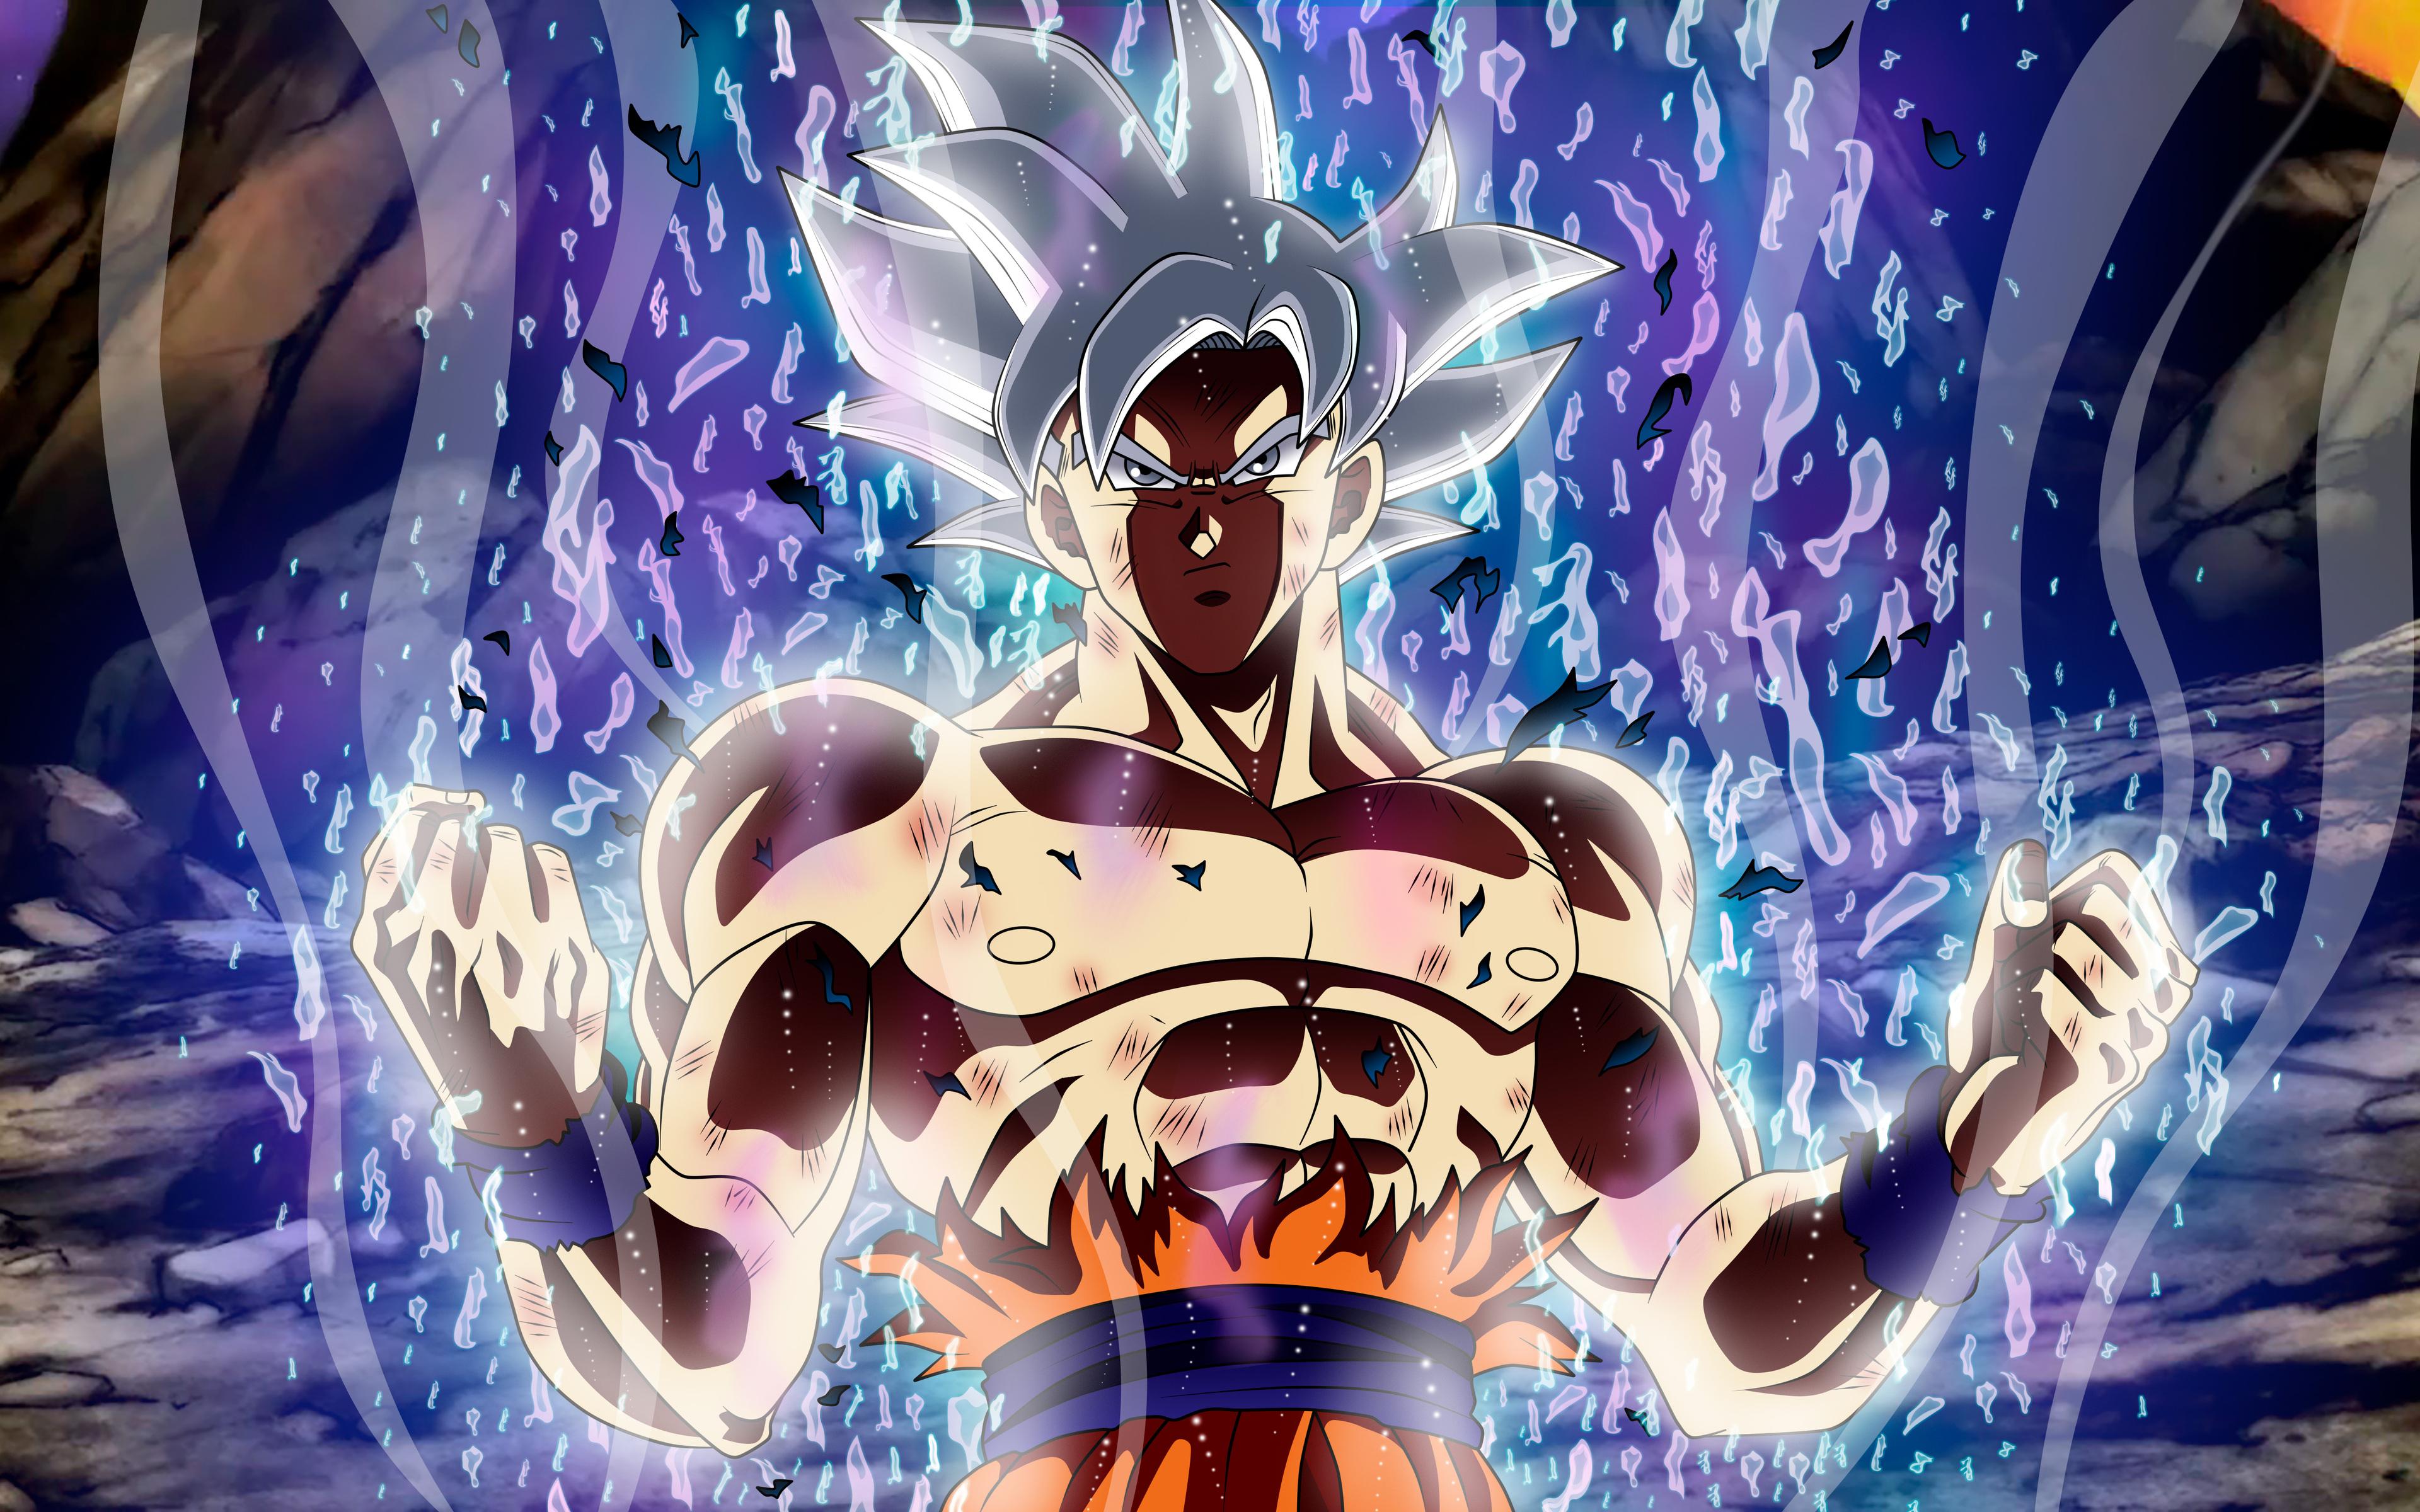 Goku And Vegeta Full Hd Fondo De Pantalla And Fondo De: Imagenes De Goku Hd 4k Para Fondo De Pantalla